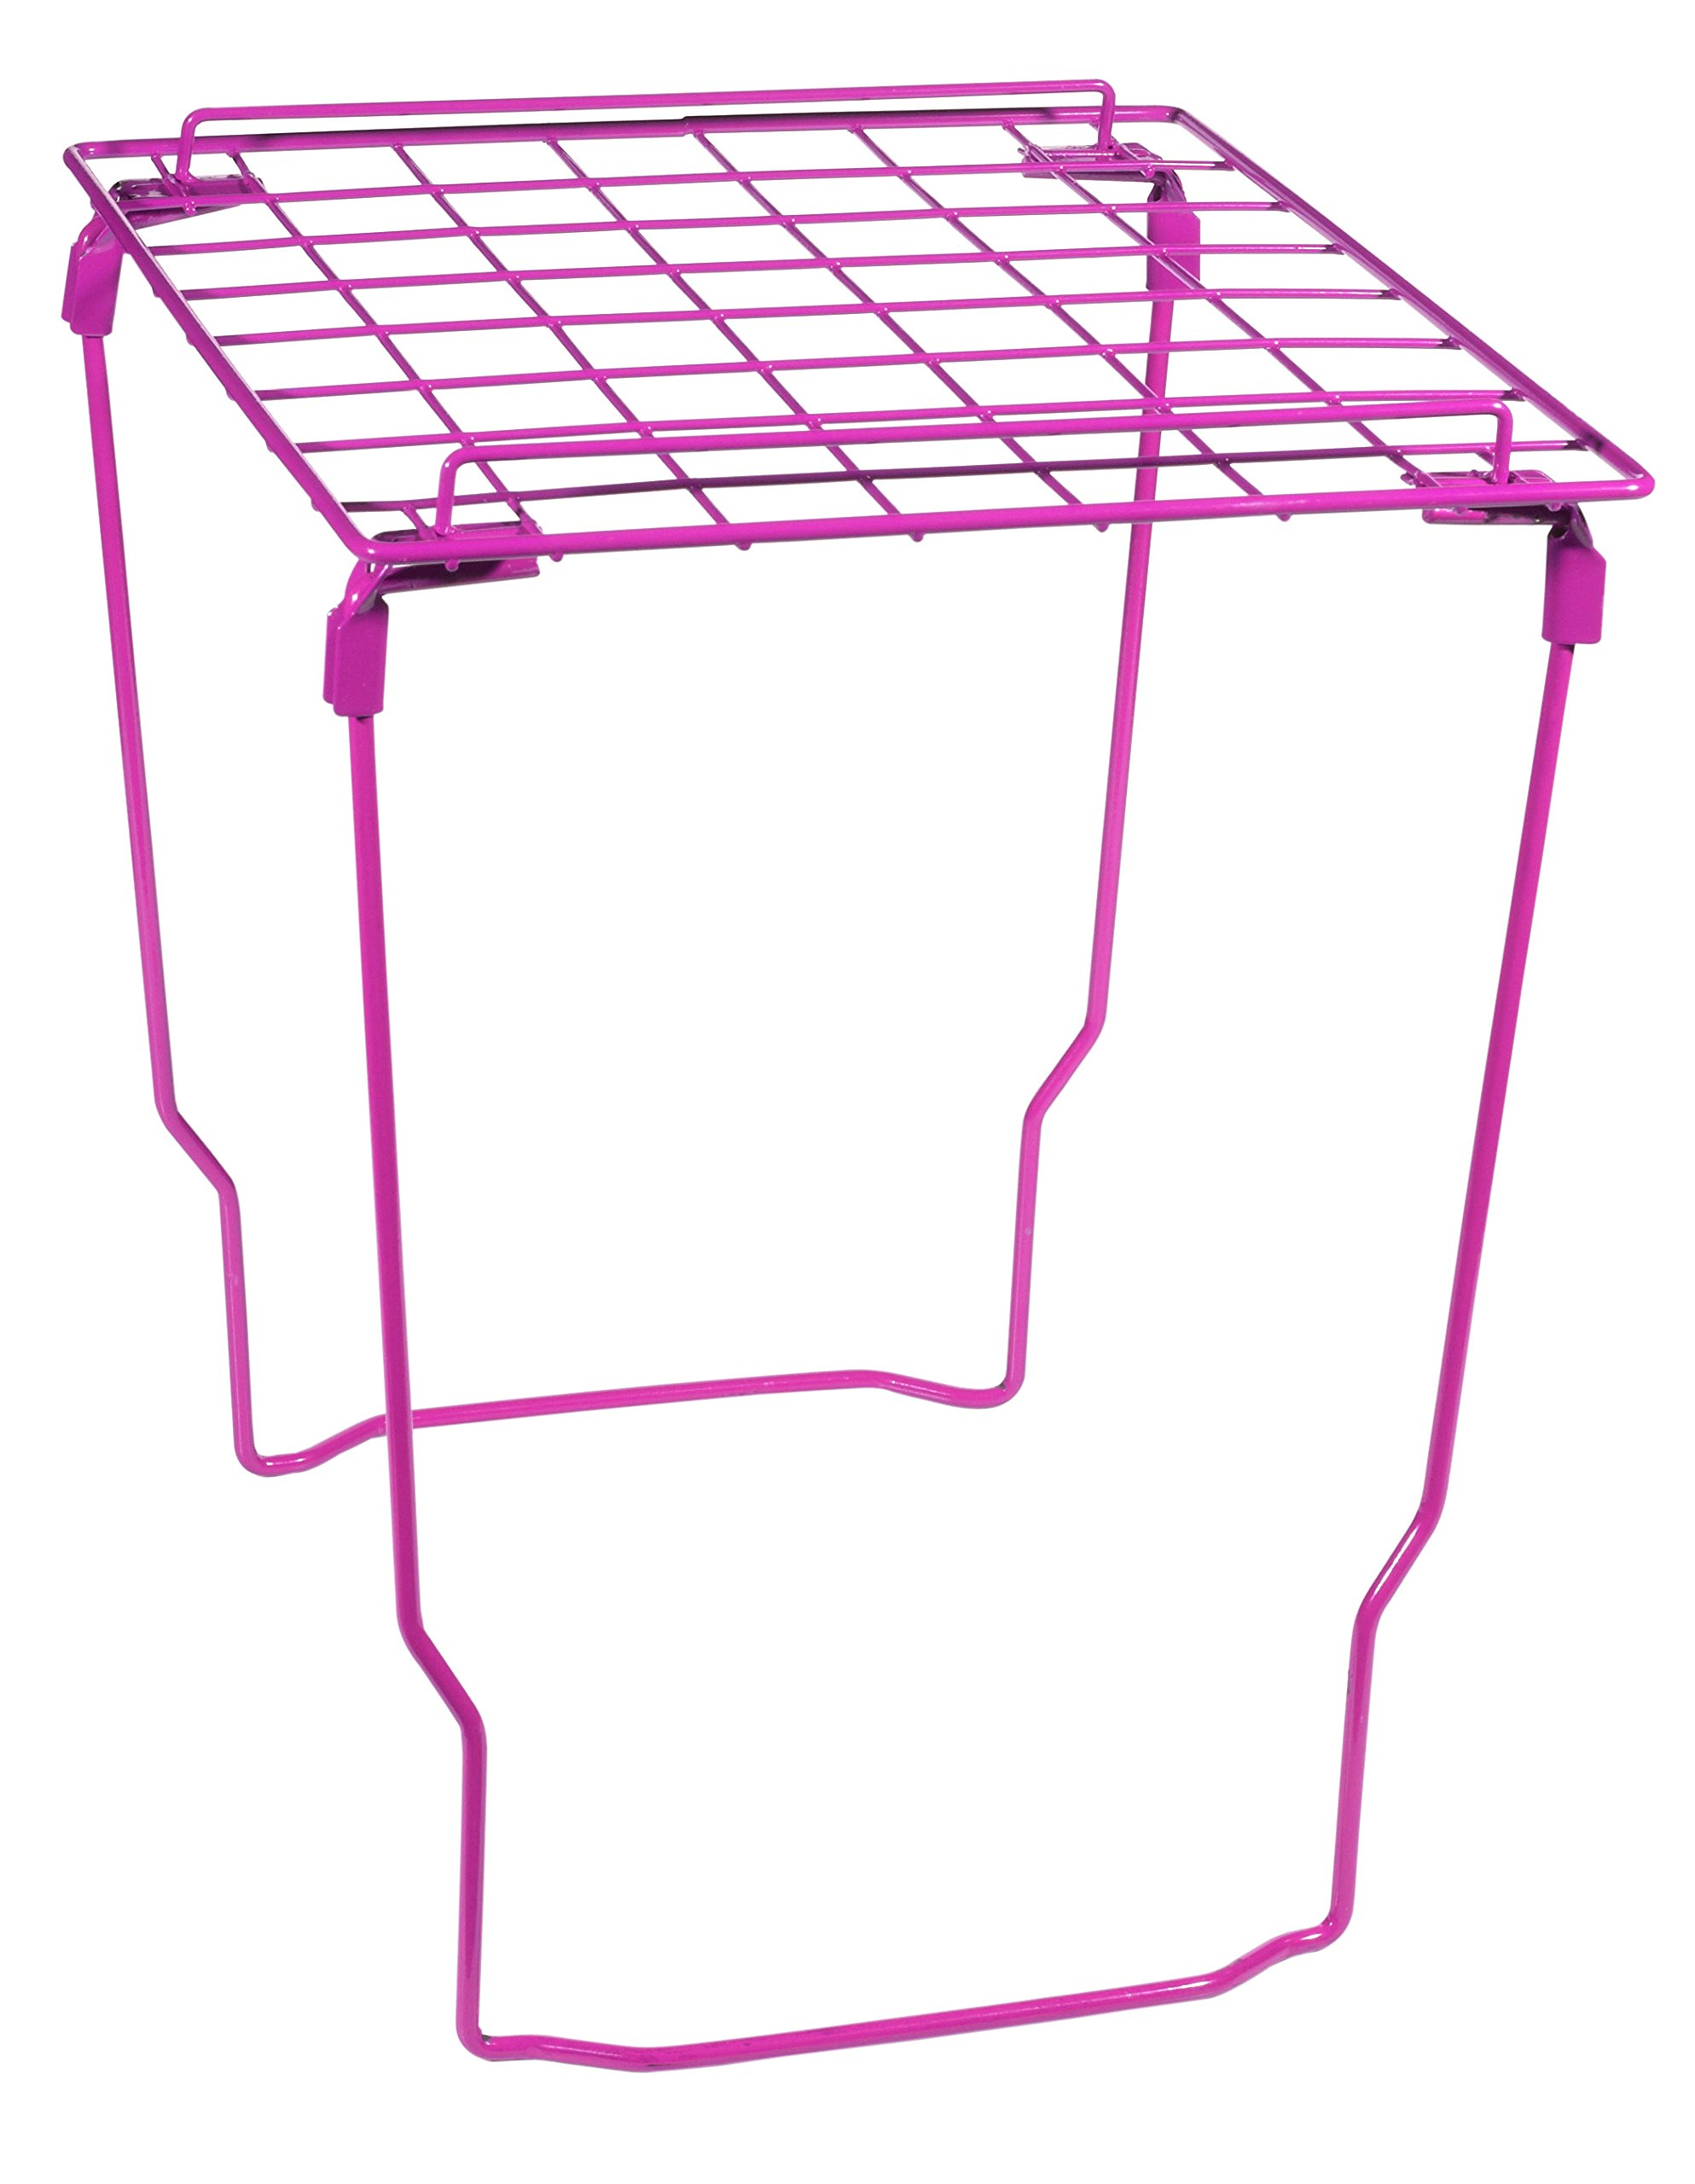 School Locker Decor/ Accessories Set - Locker Shelf, Magnetic Locker Curtain & Stylish Magnets by Style It